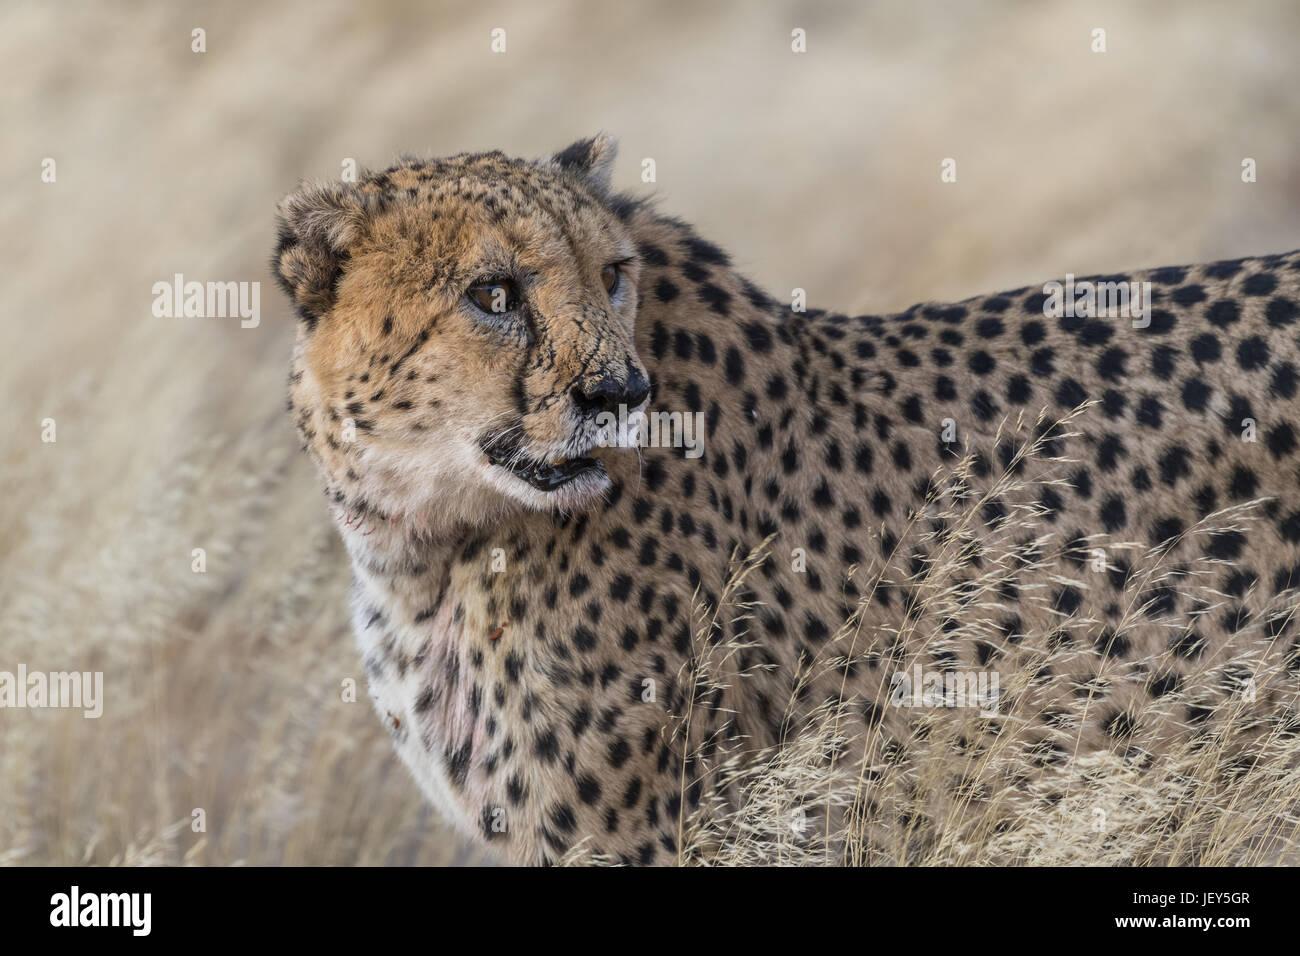 Cheetah, (Acinonyx jubatus) Stock Photo